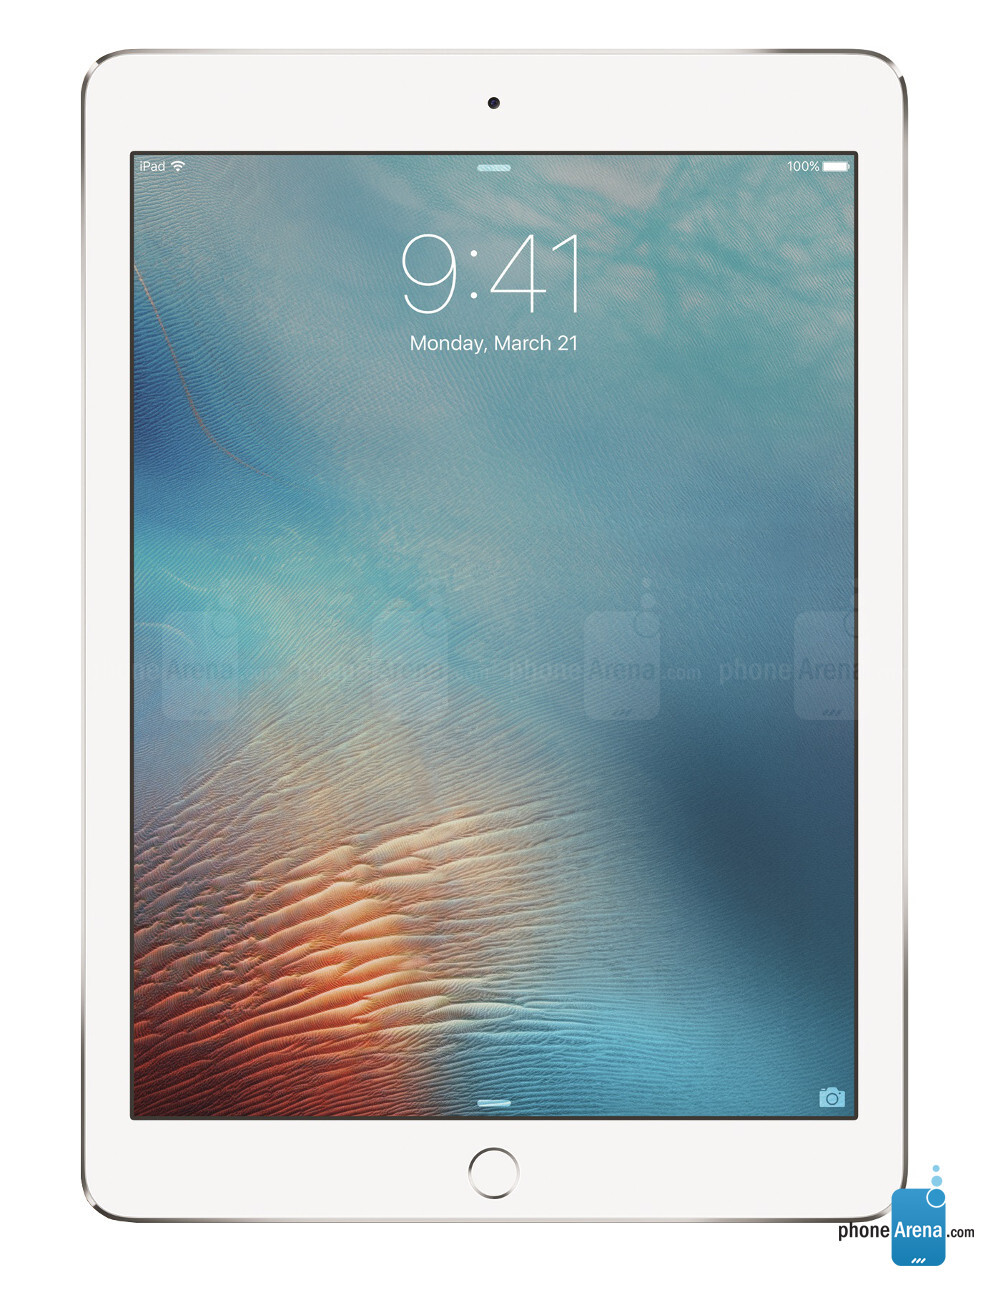 Apple iPad Pro 9.7-inch specs